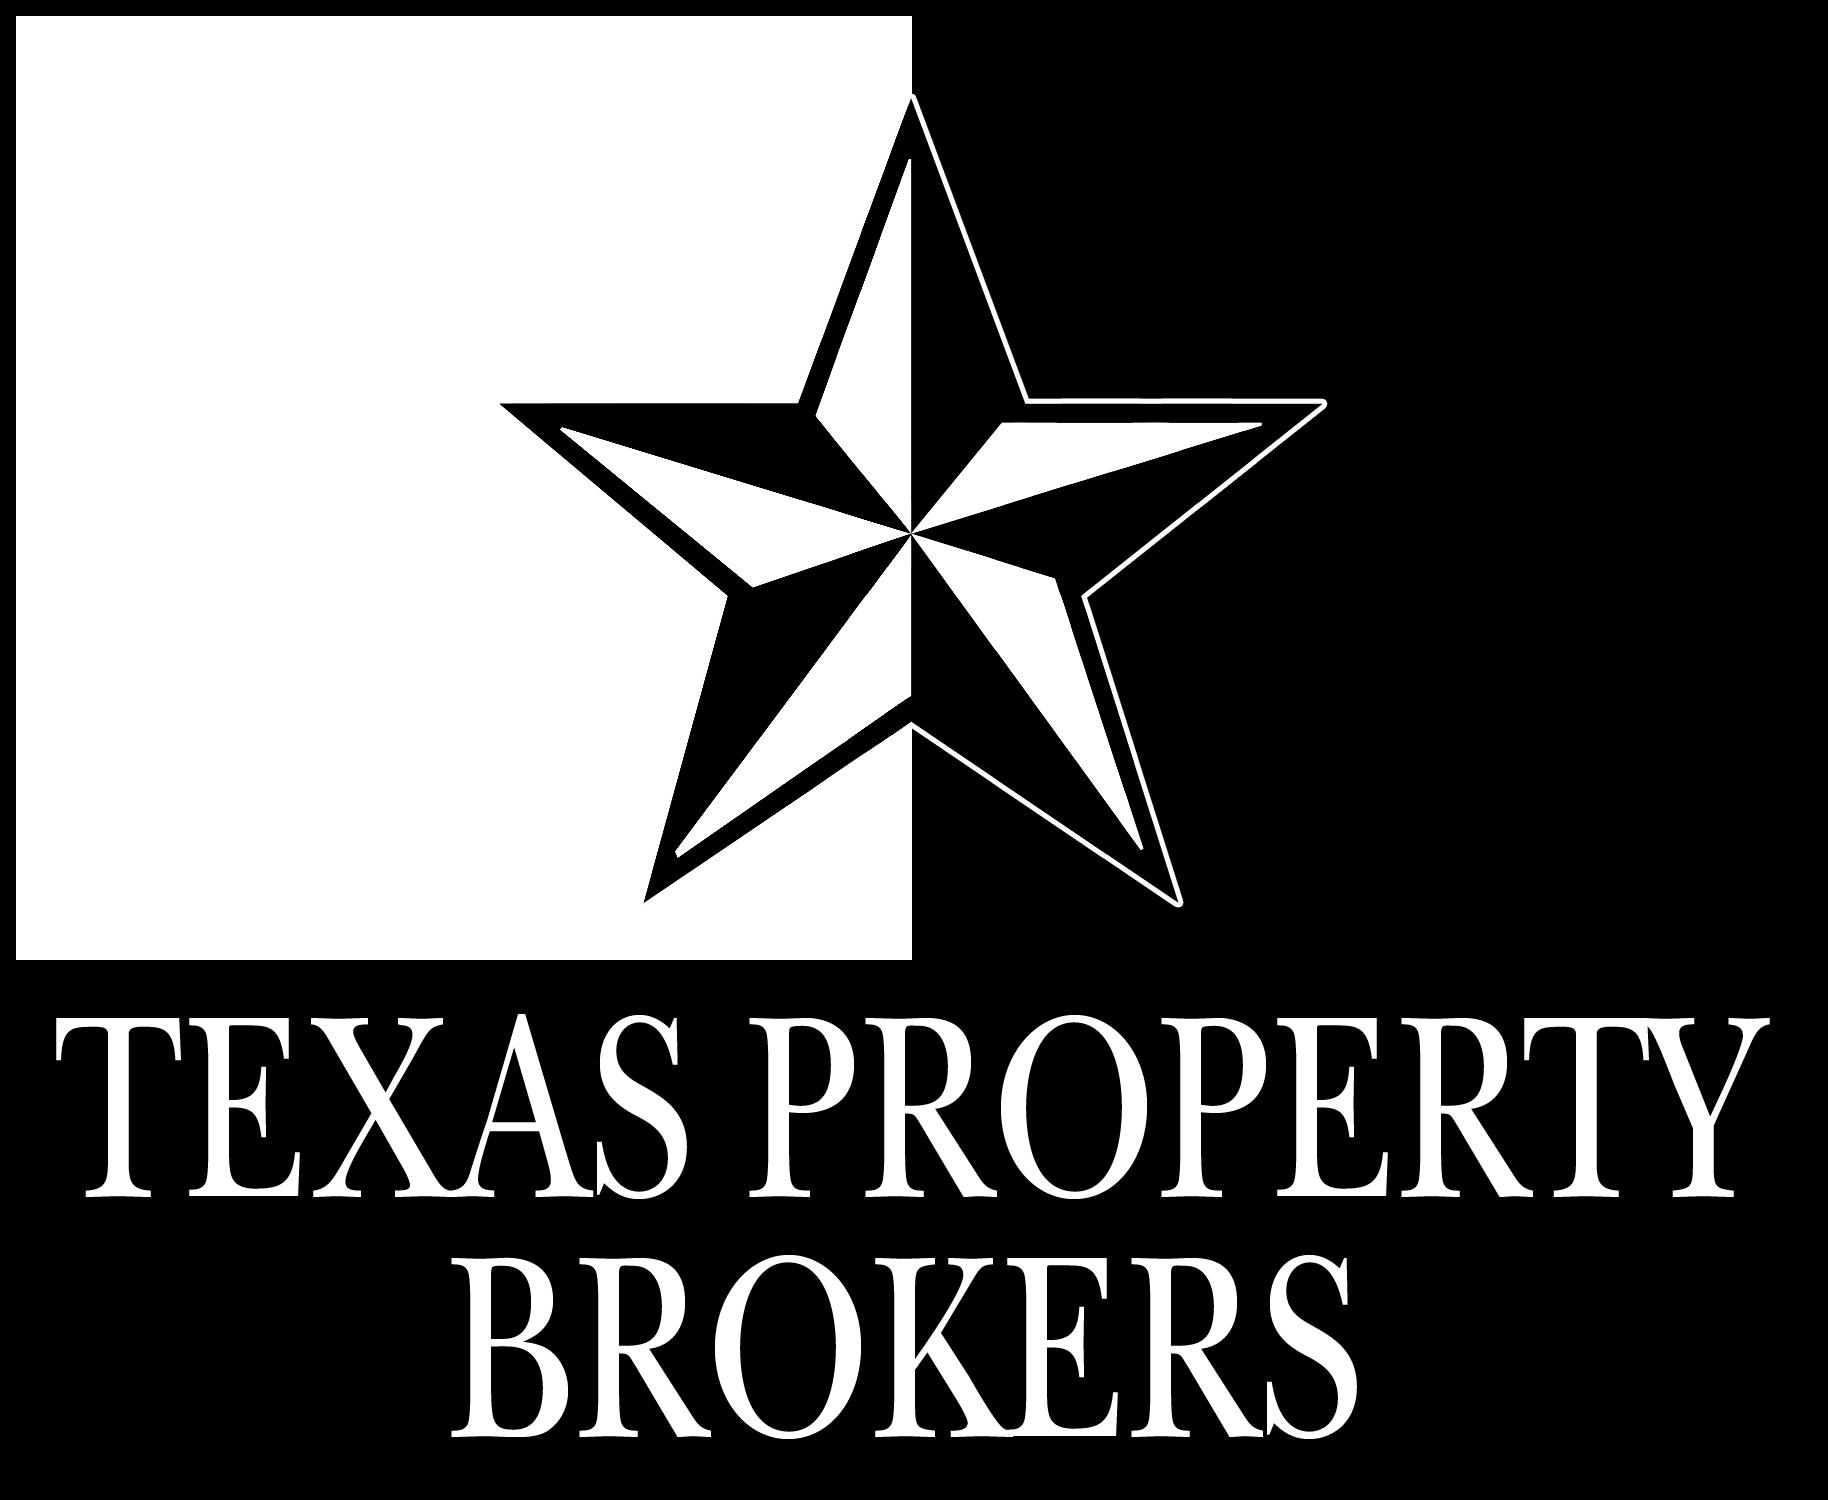 LOGO-TexasPropertyBrokers (1).jpg